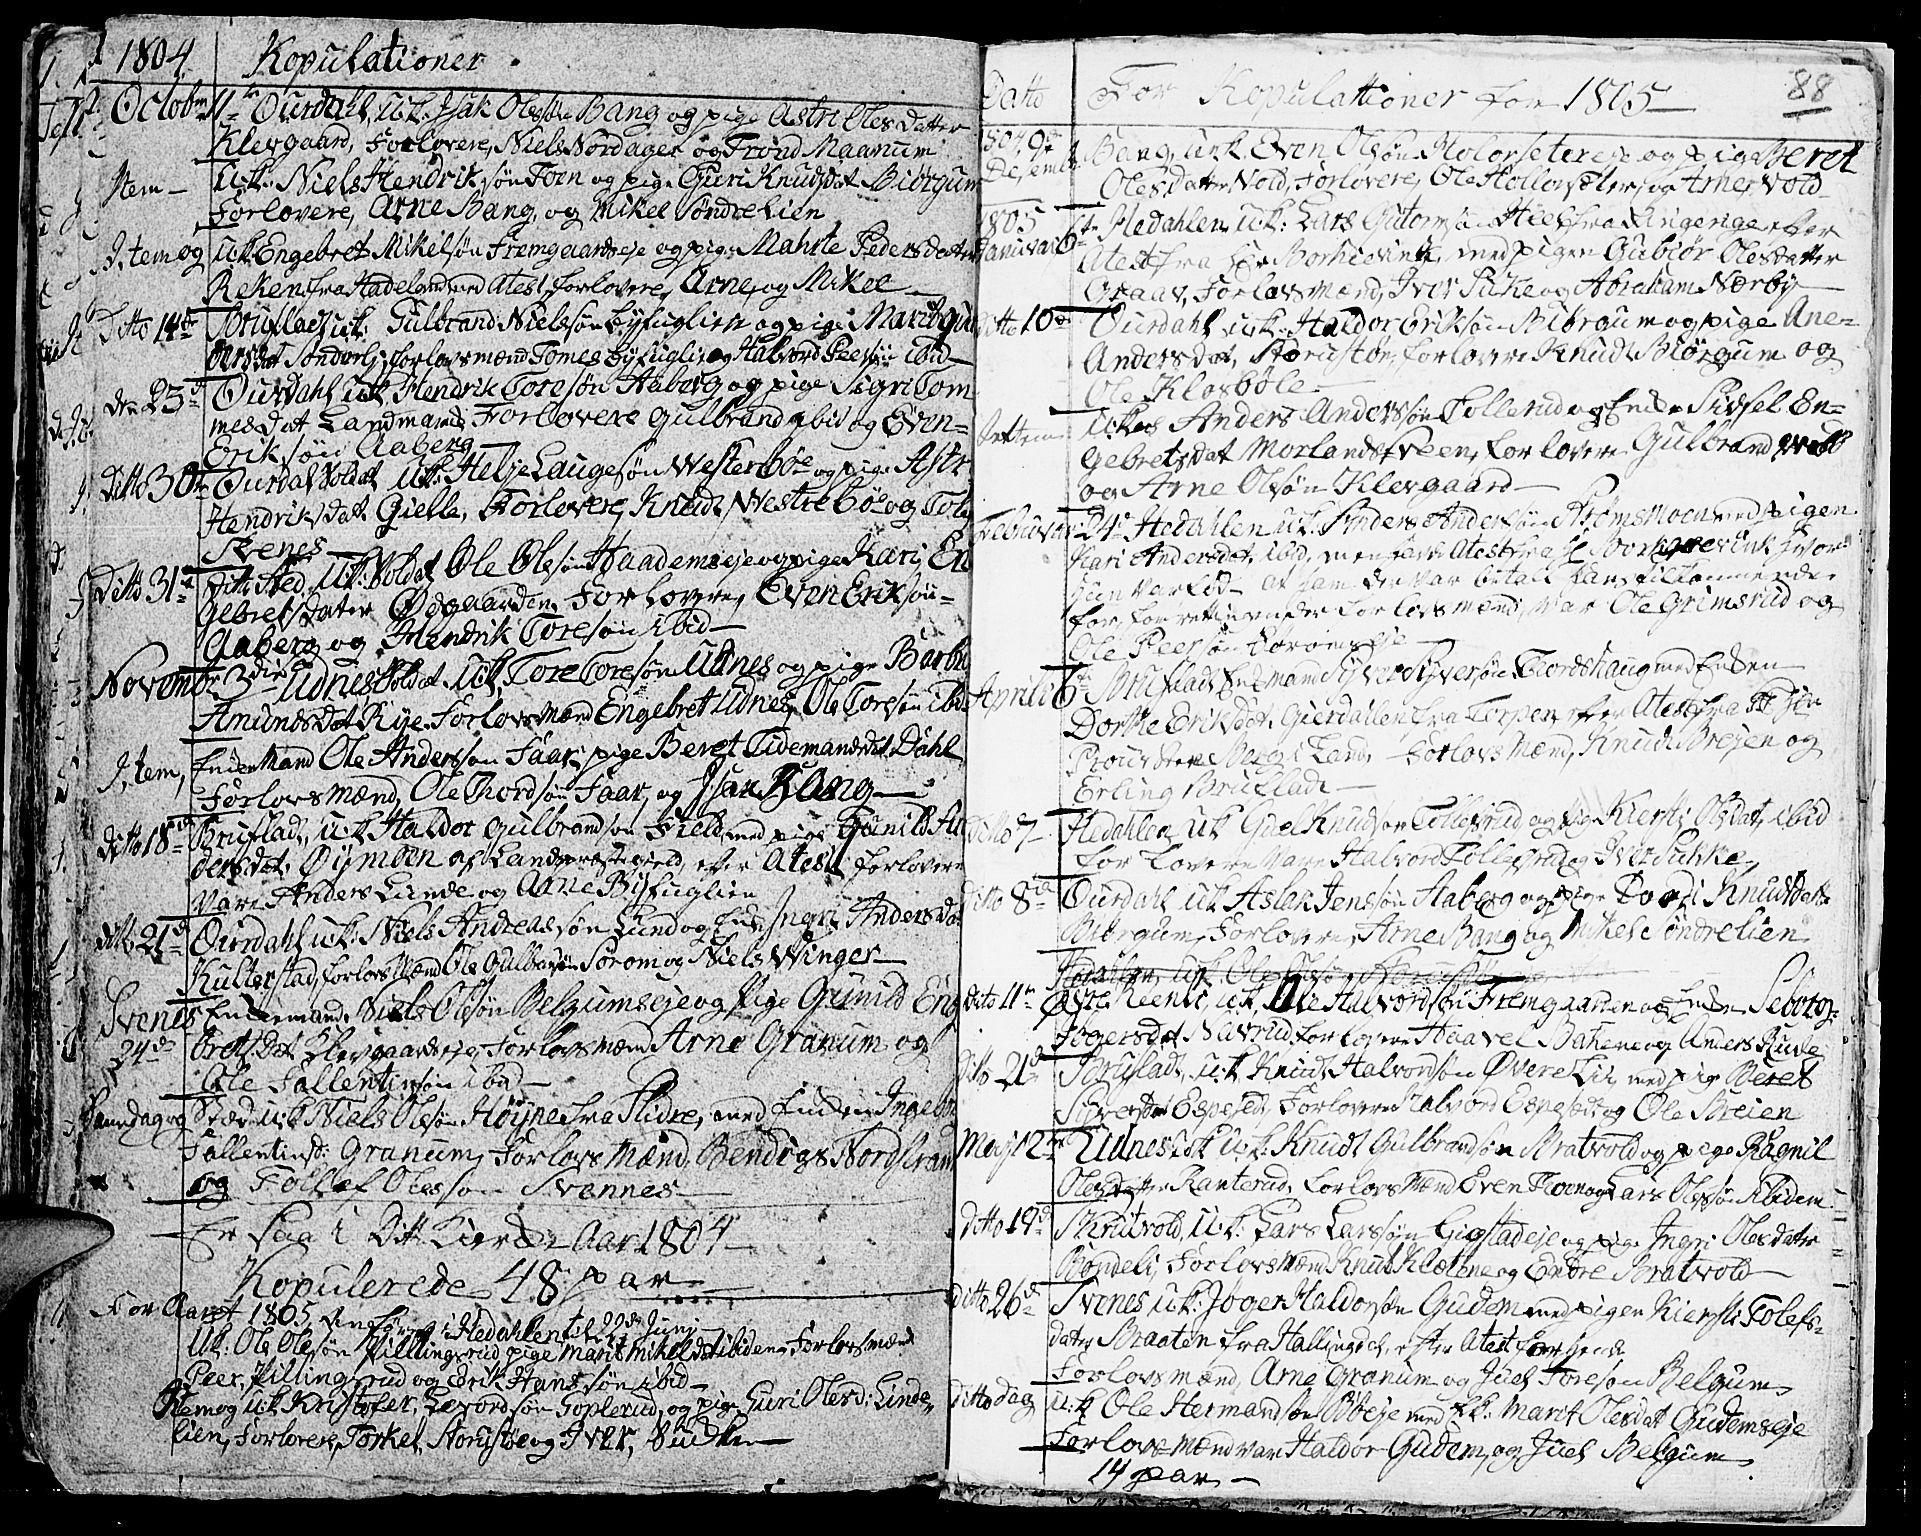 SAH, Aurdal prestekontor, Ministerialbok nr. 7, 1800-1808, s. 88